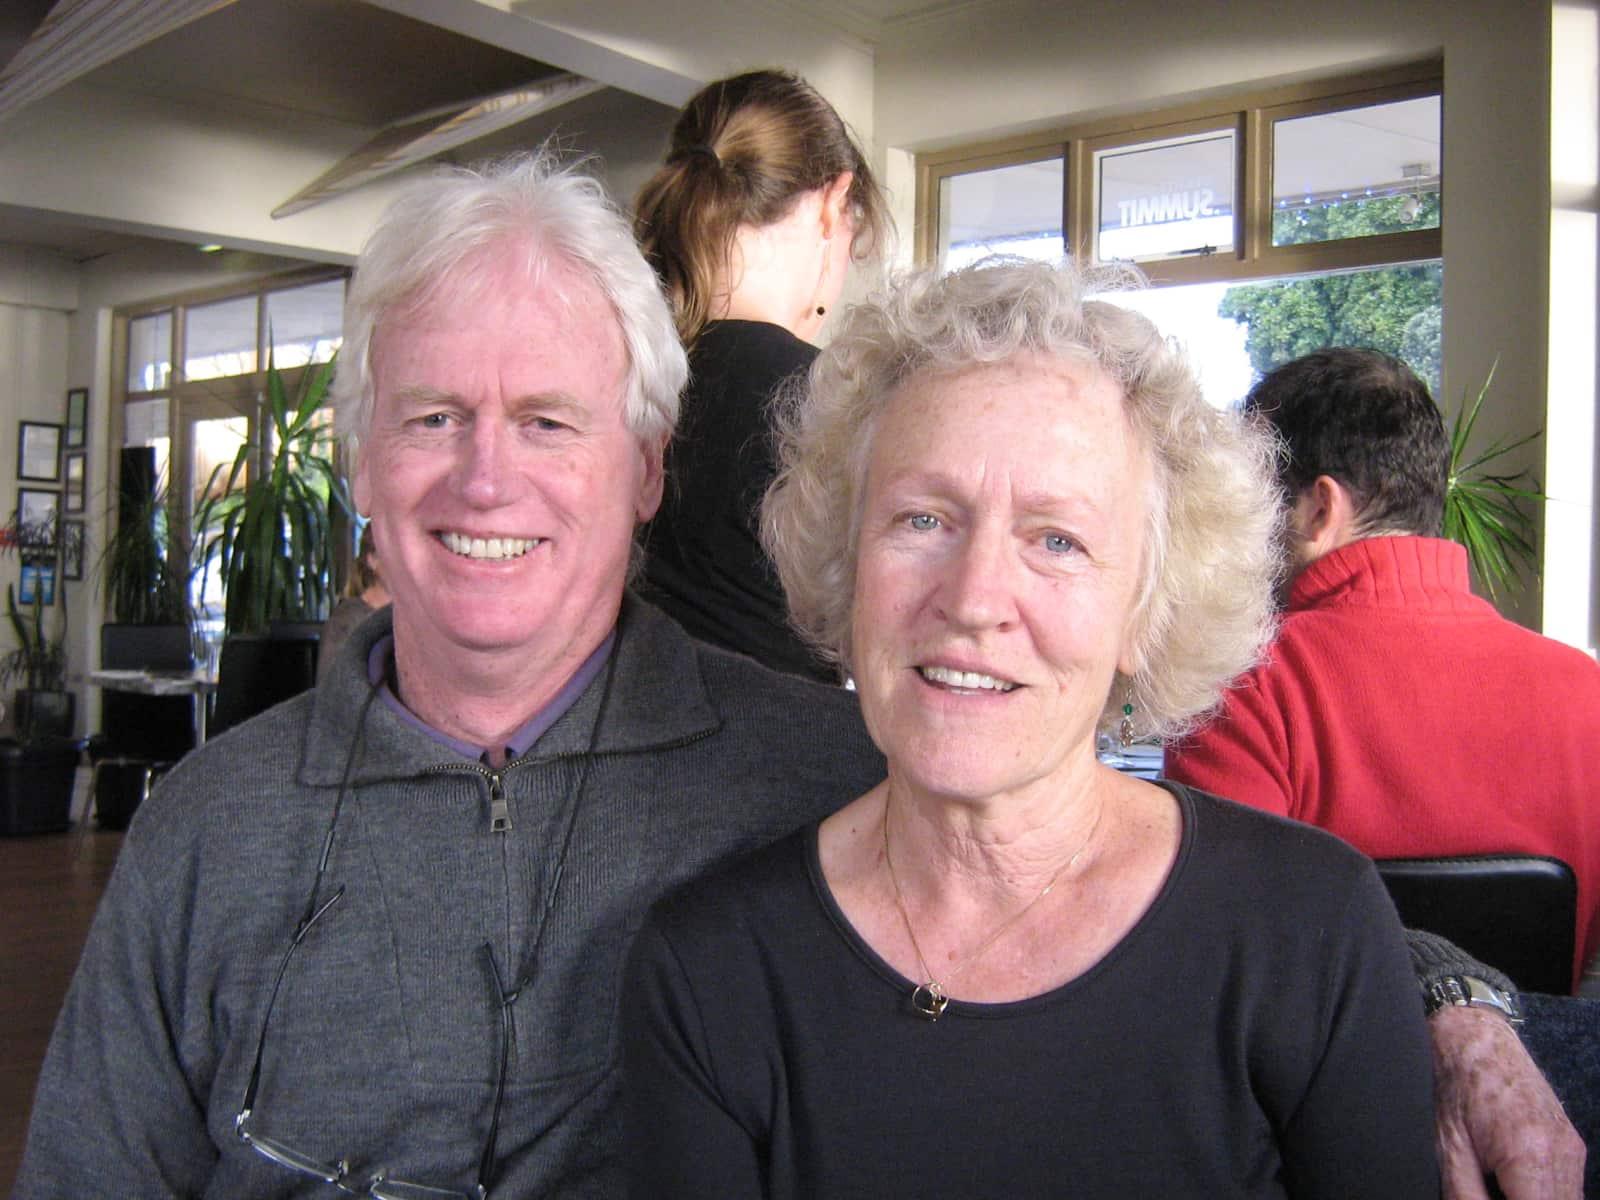 Stephen & Stephanie from Pauanui, New Zealand